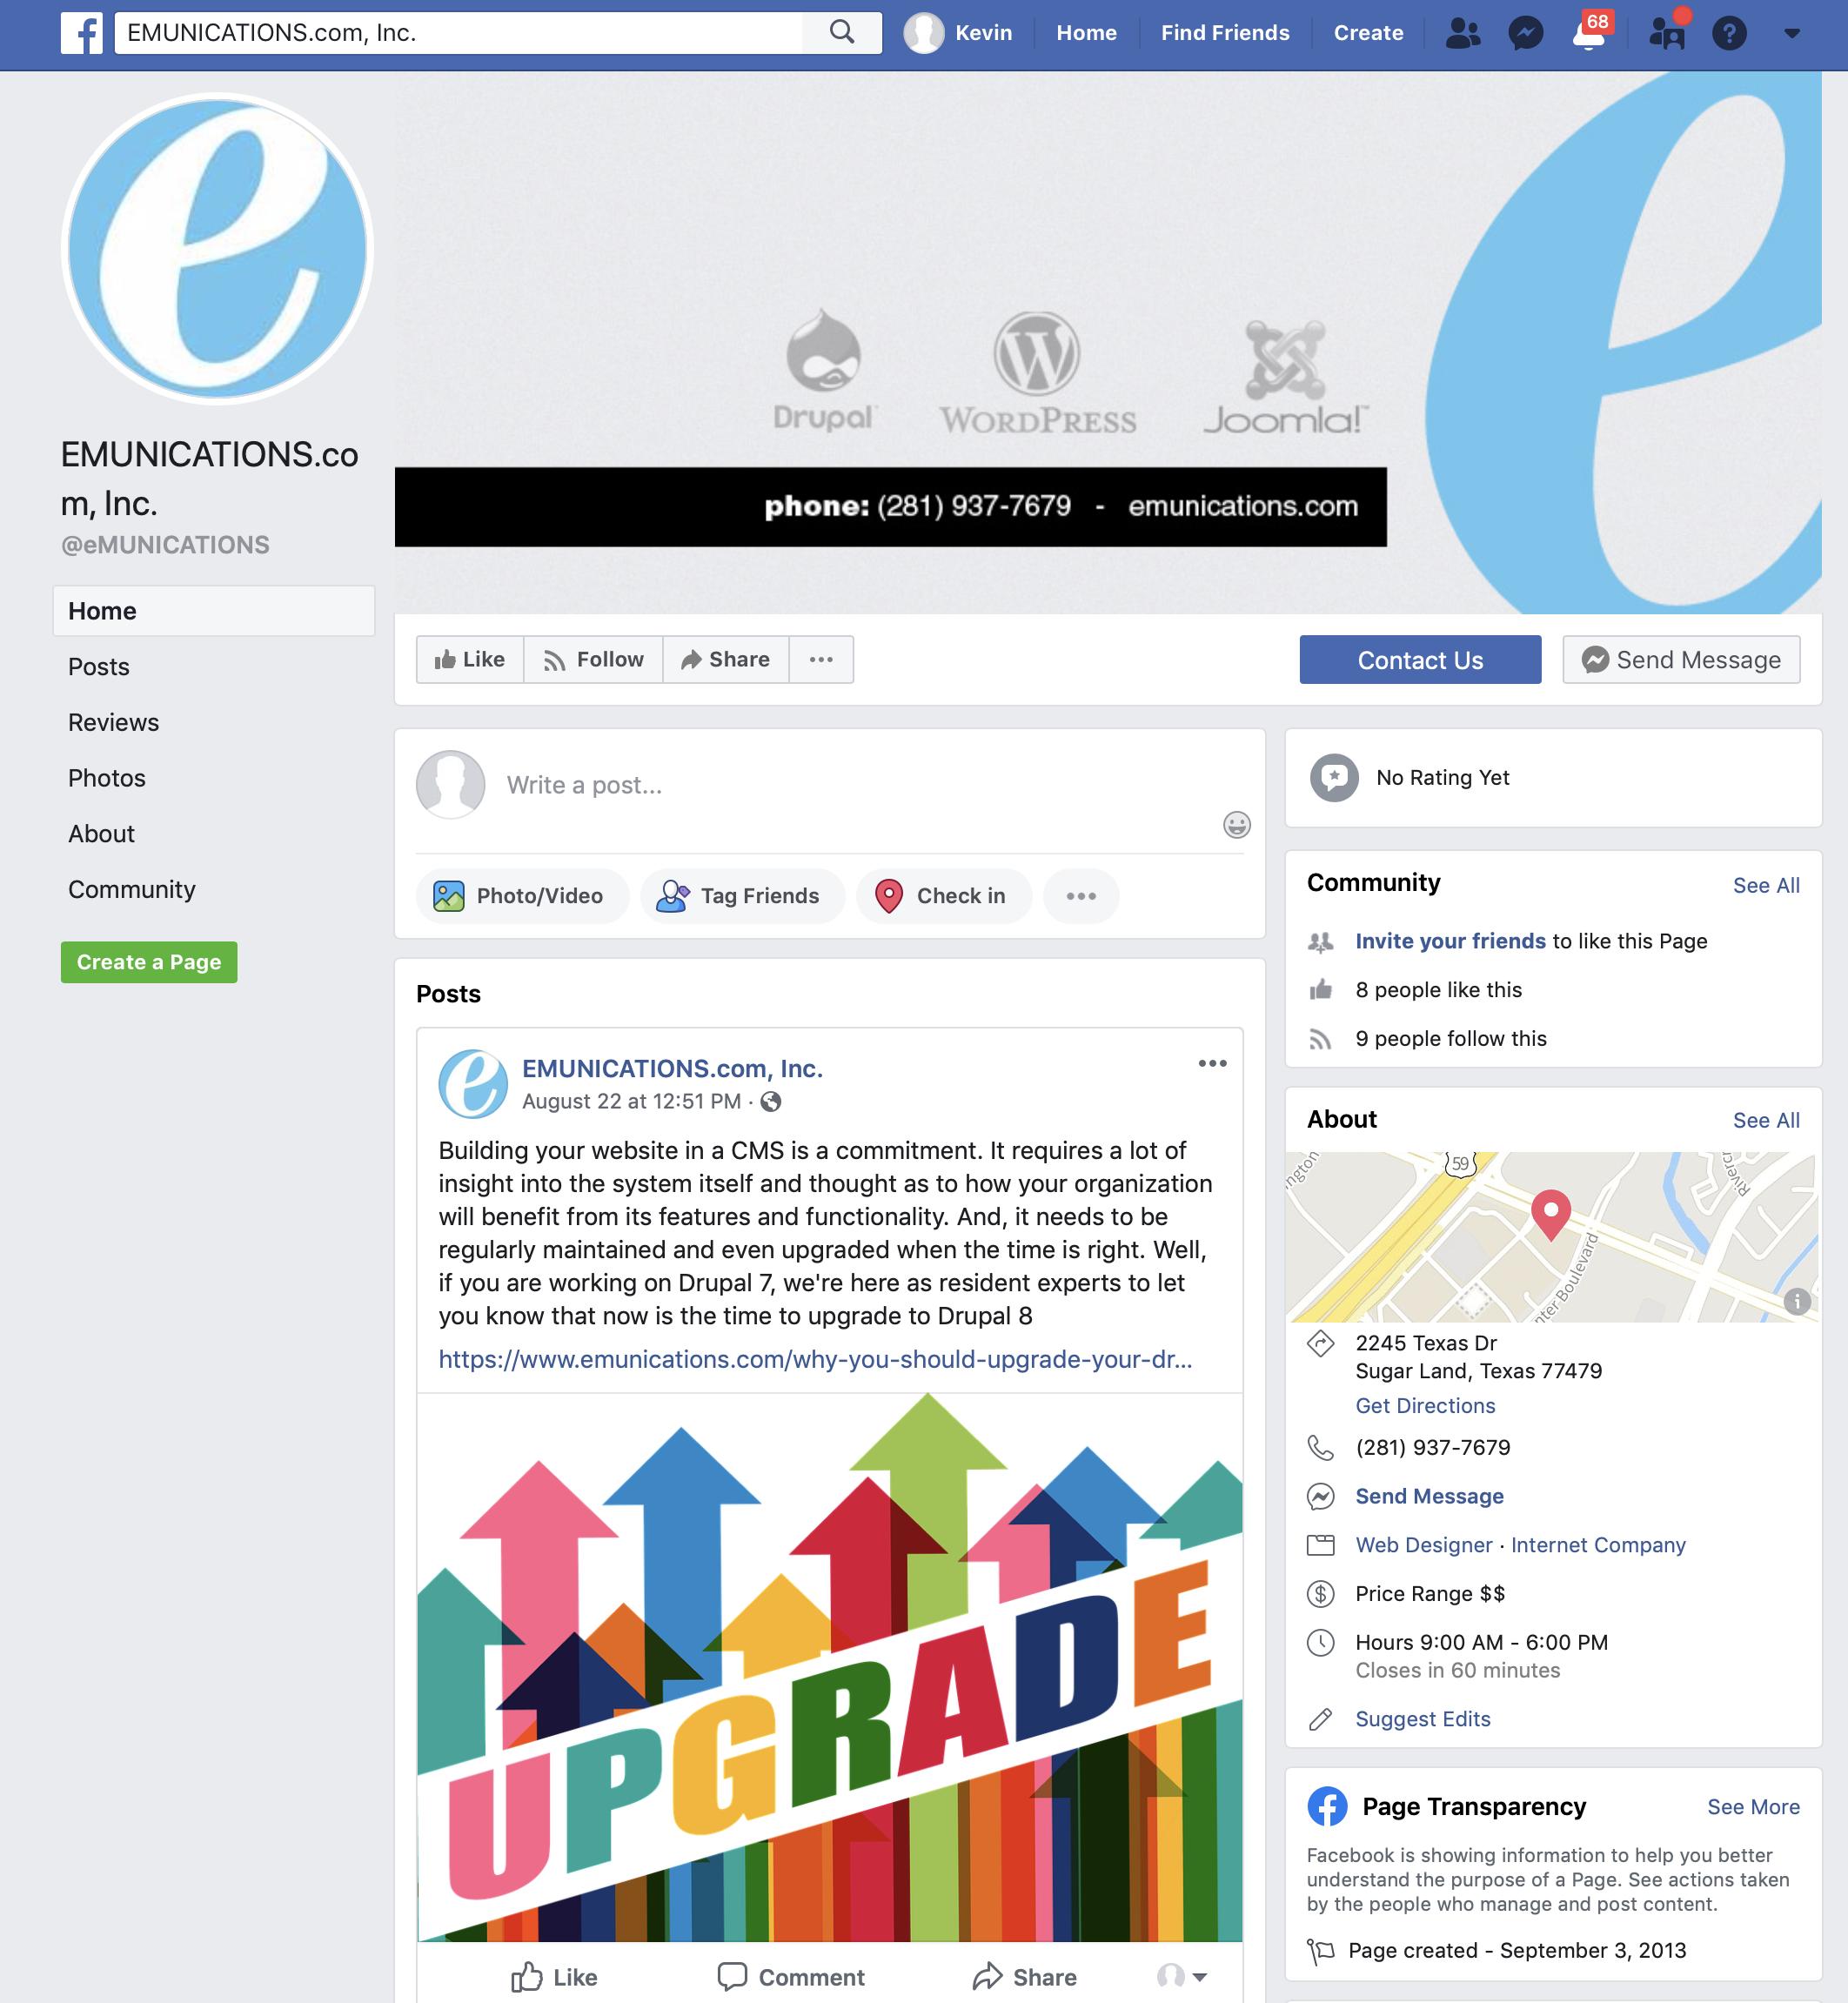 Facebook-emunications